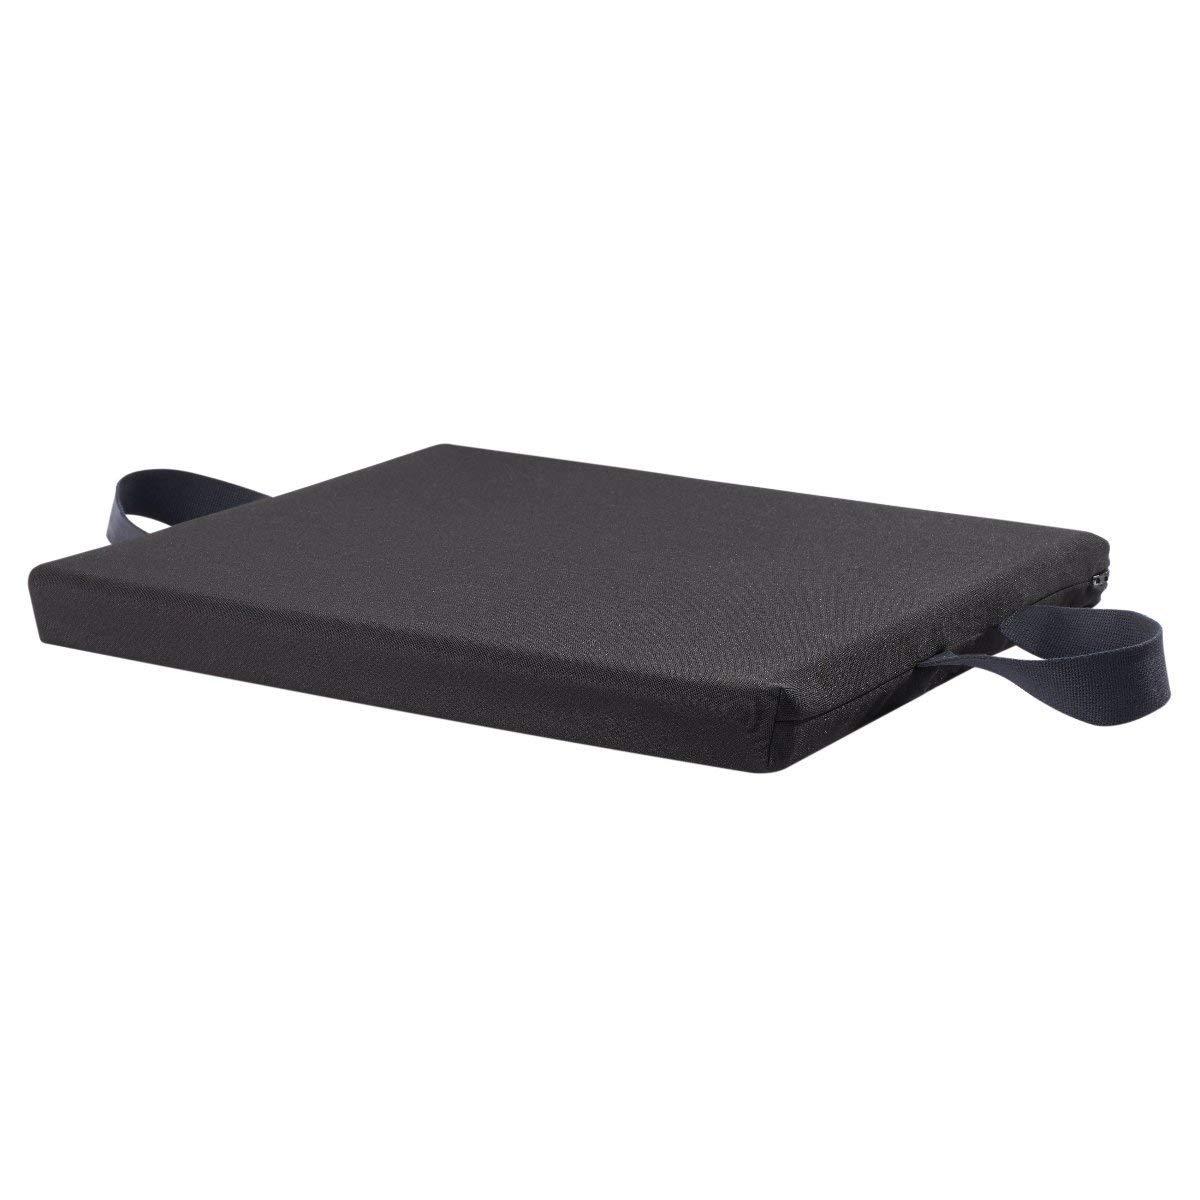 "Sammons Preston Gel Right Plus Foam, 20"" x 18"" x 1-3/4"" Checkerboard, Wheelchair Cushion for Reducing Pain and Increasing Comfort, Wheelchair Seat Cushion, Orthopedic Pad, T-Gel Polymer & Fabric Cover 61hKoqqp5aL._SL1200_"